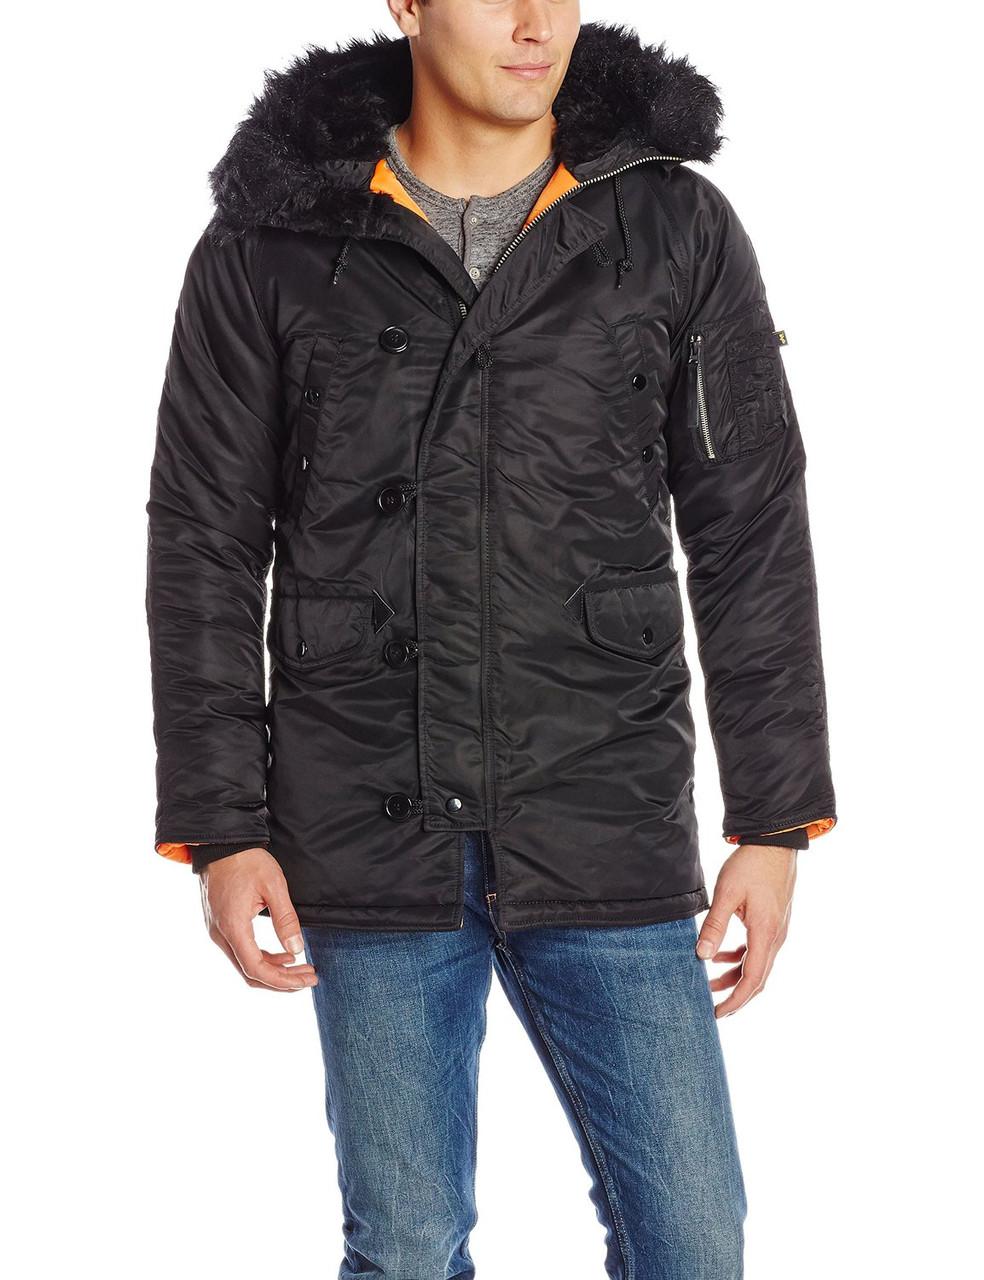 6da13822 Куртка Alpha Slim Fit N-3B Parka - Black/orange: продажа, цена ...